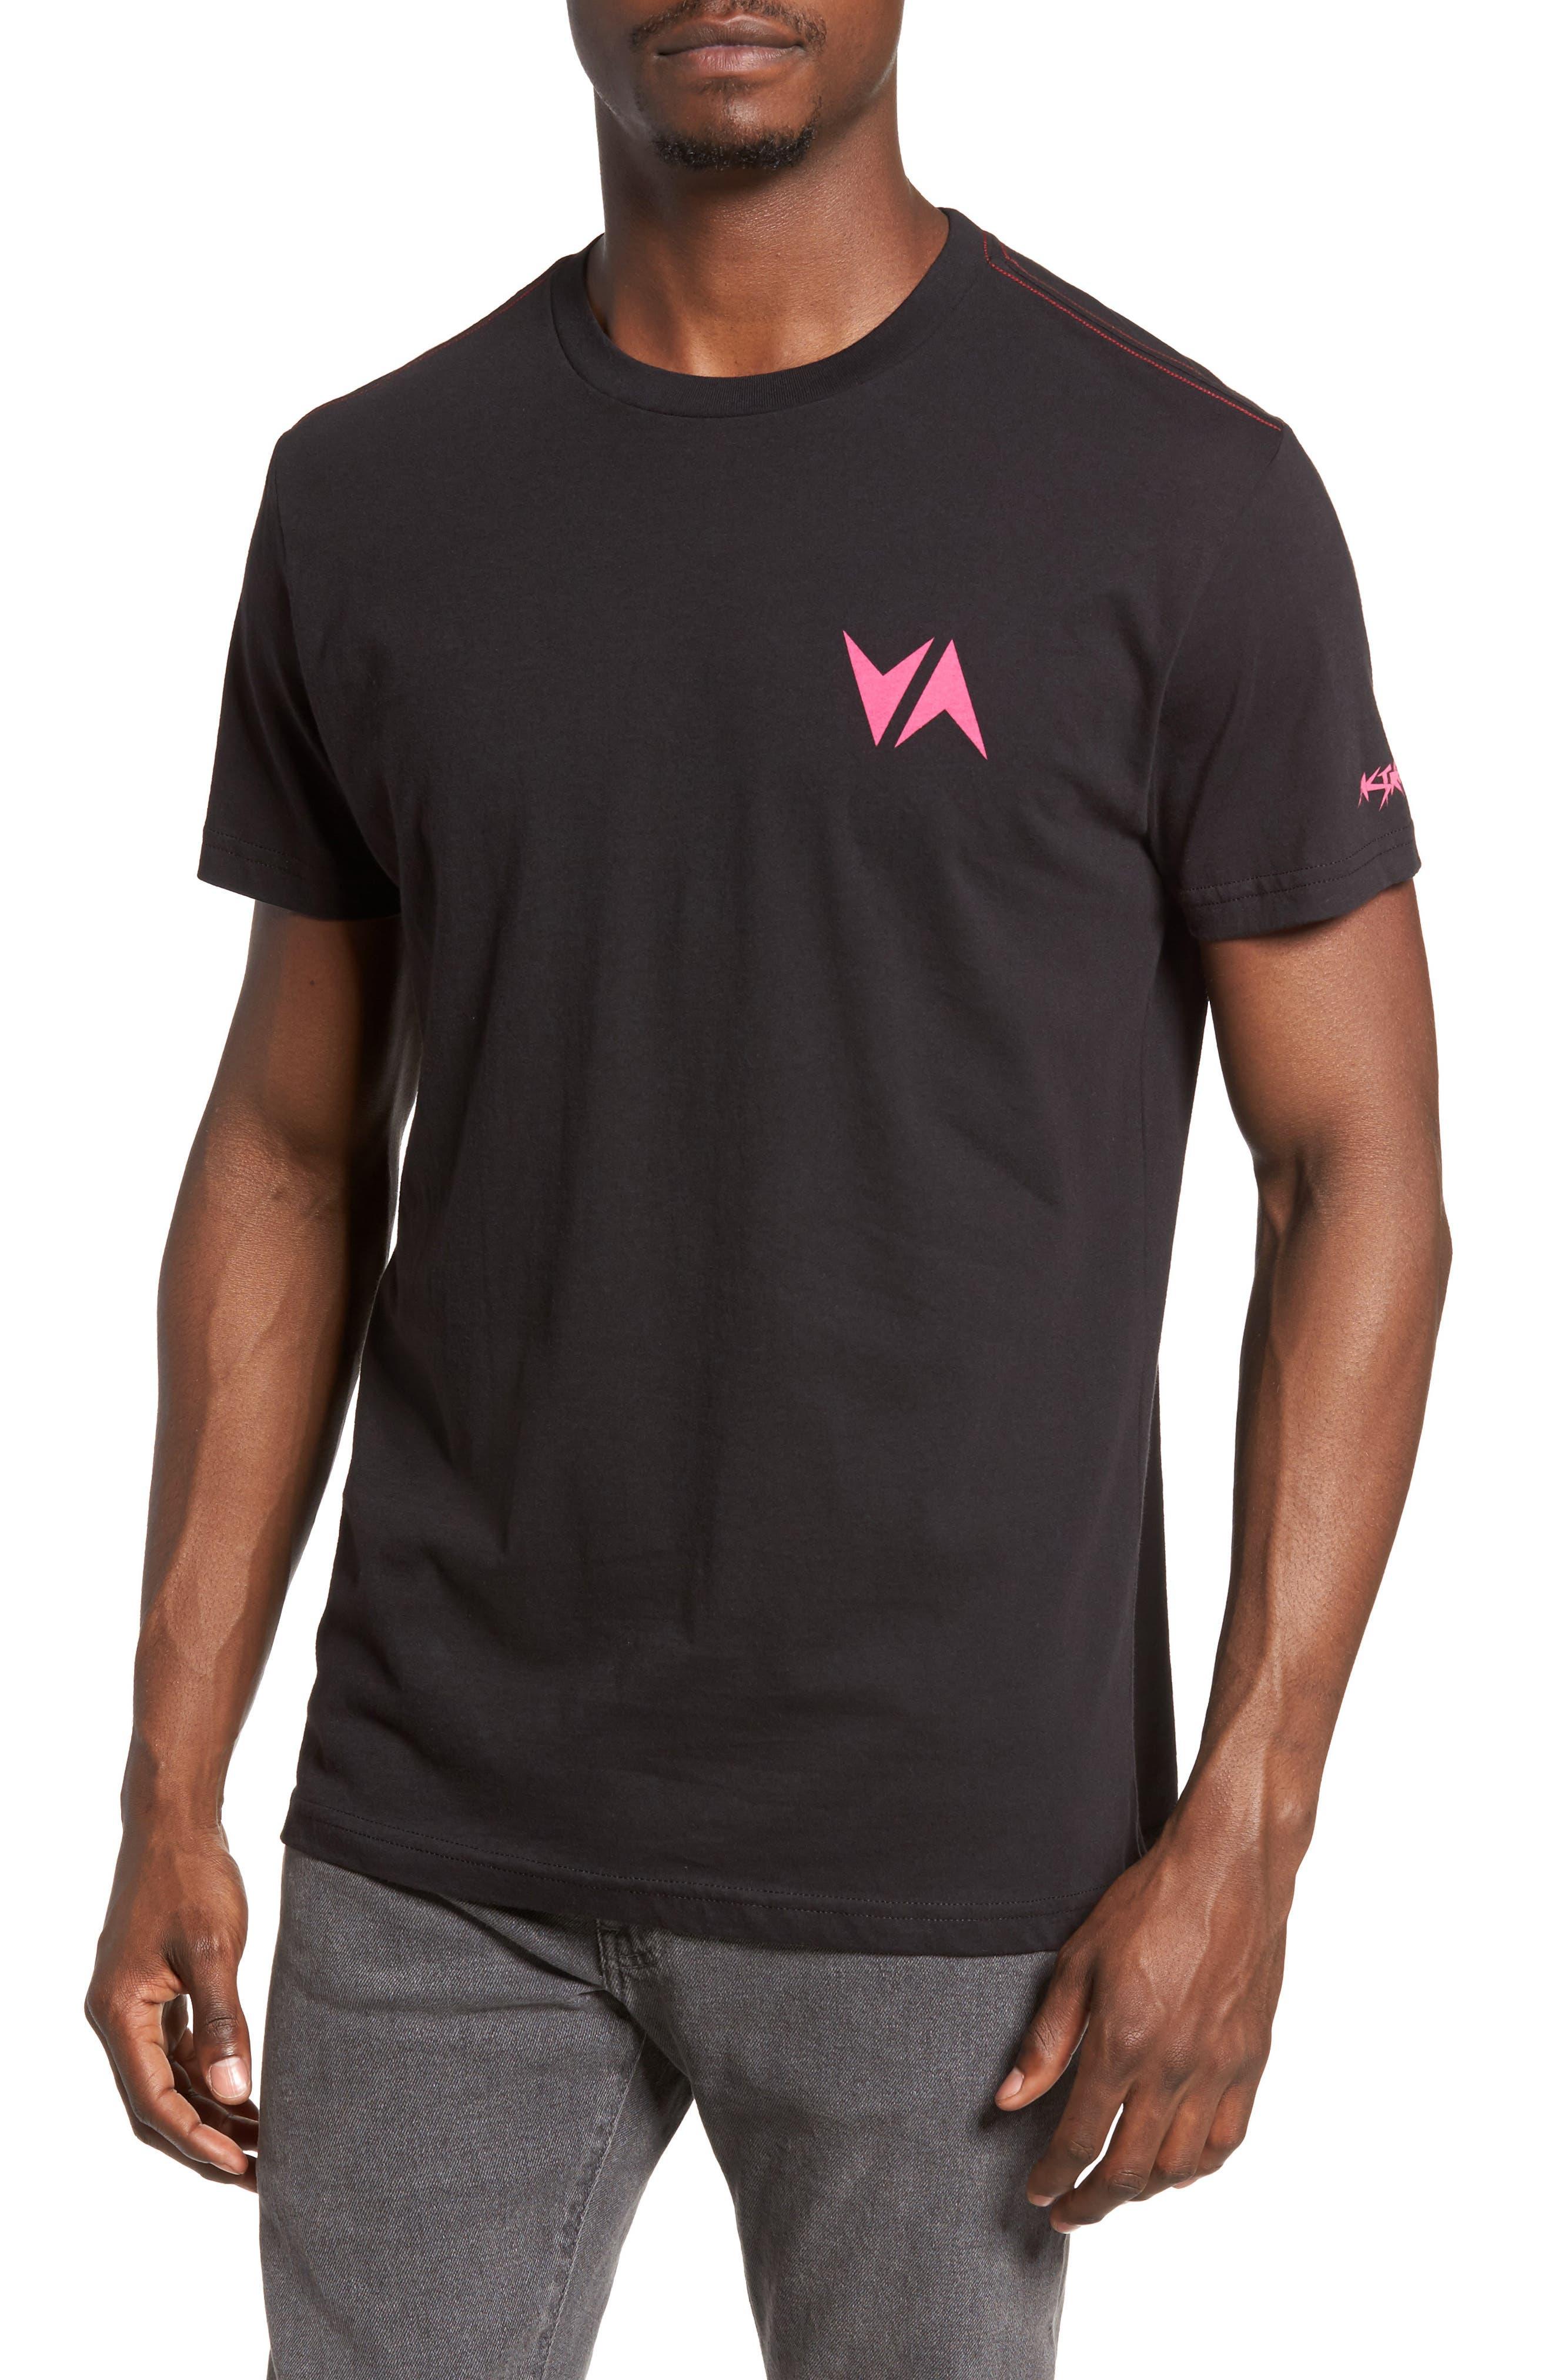 RVCA Astrodeck Graphic T-Shirt